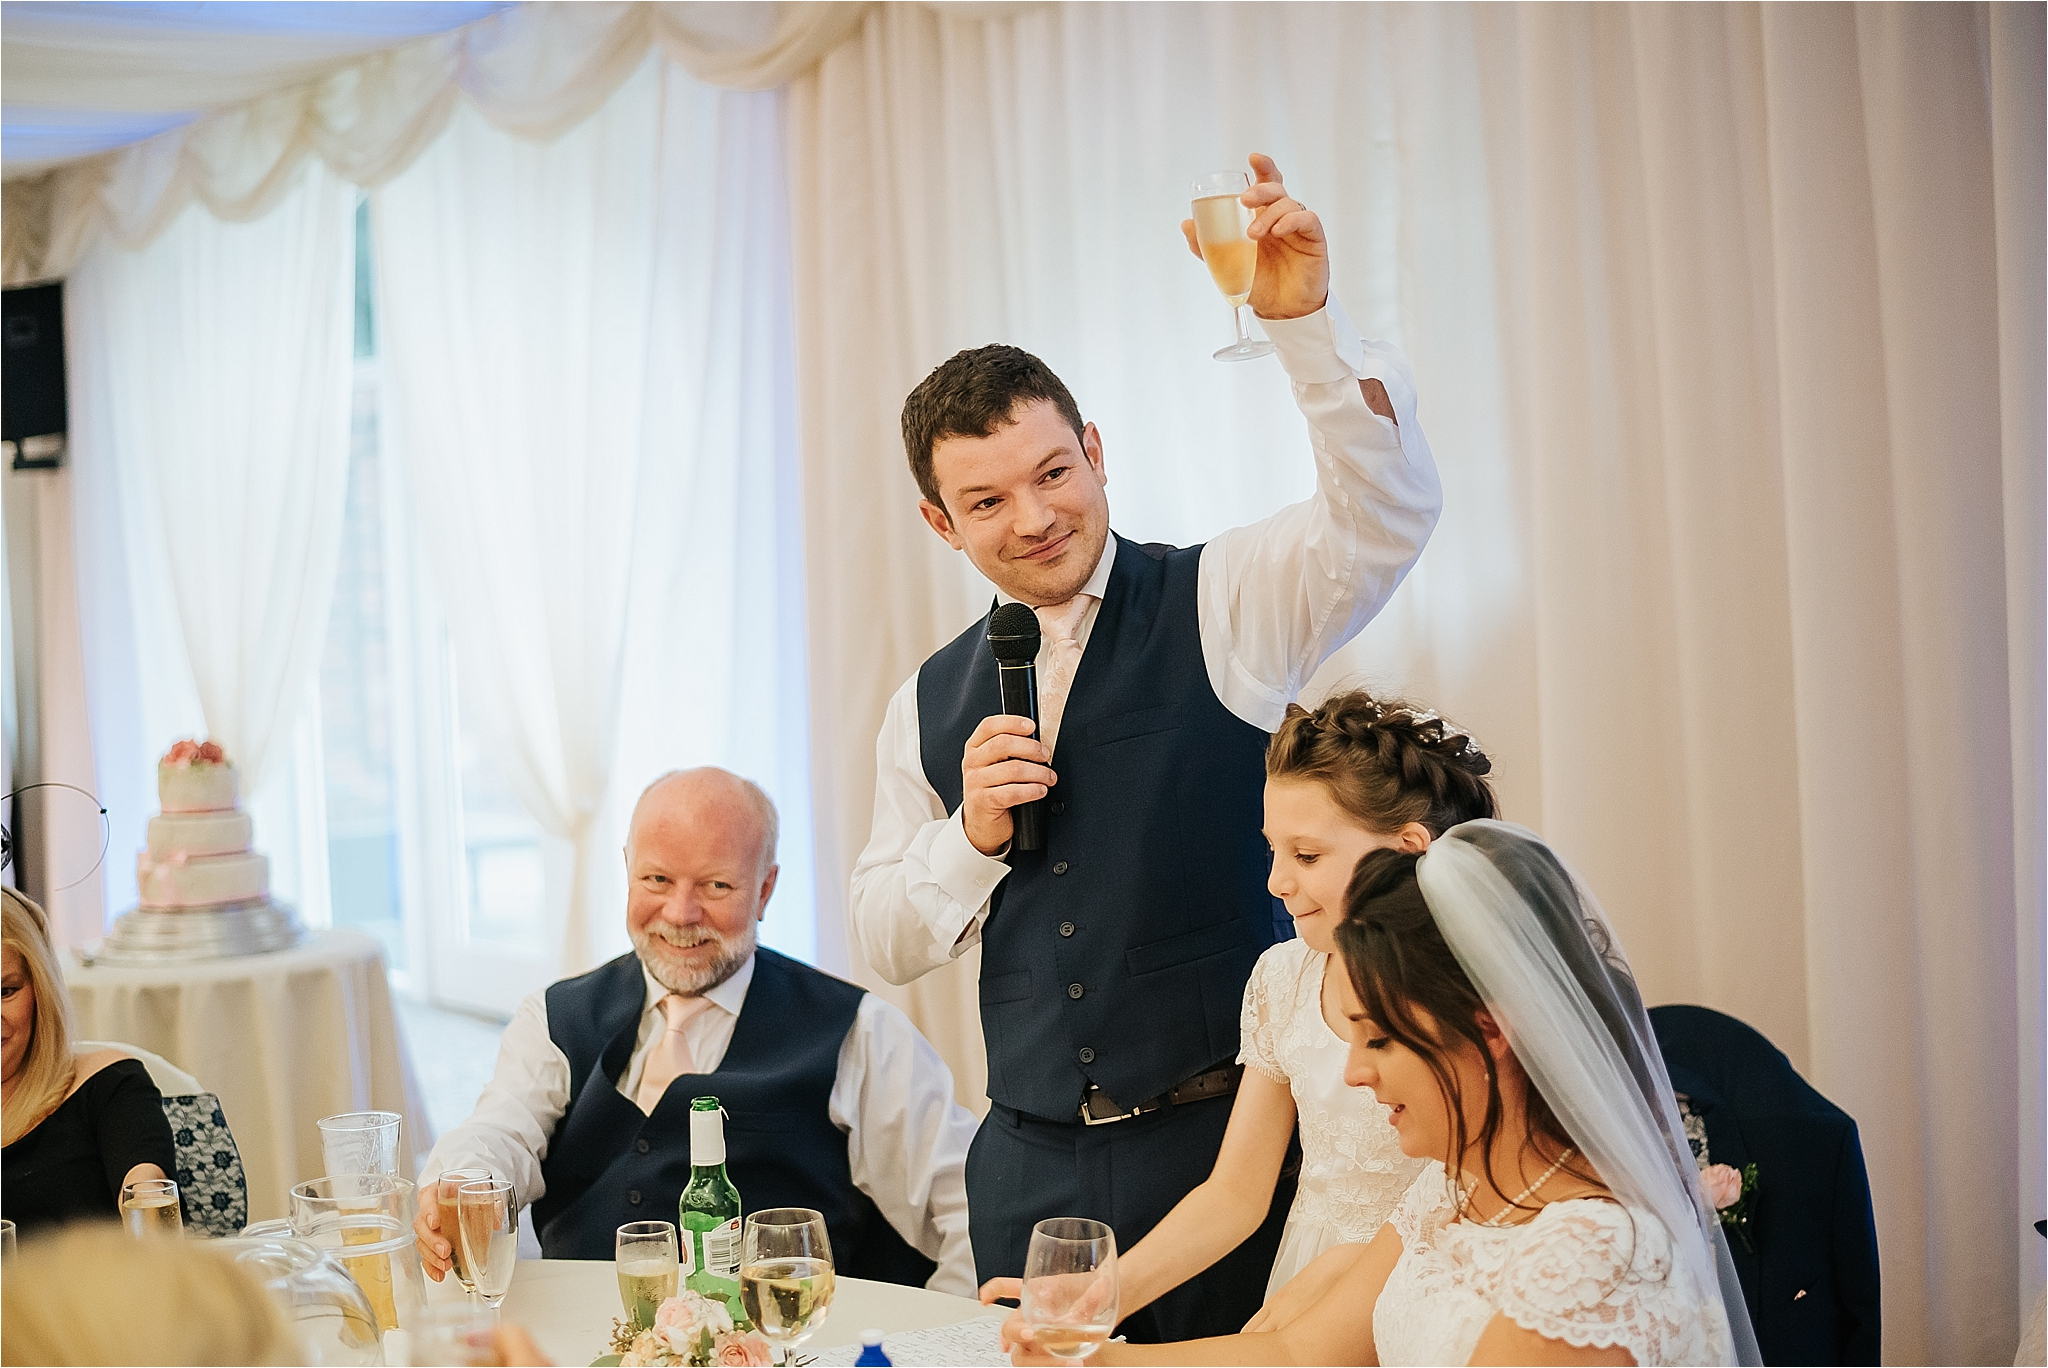 thevilla+lancashire+wreagreen+wedding+photographer50.jpg